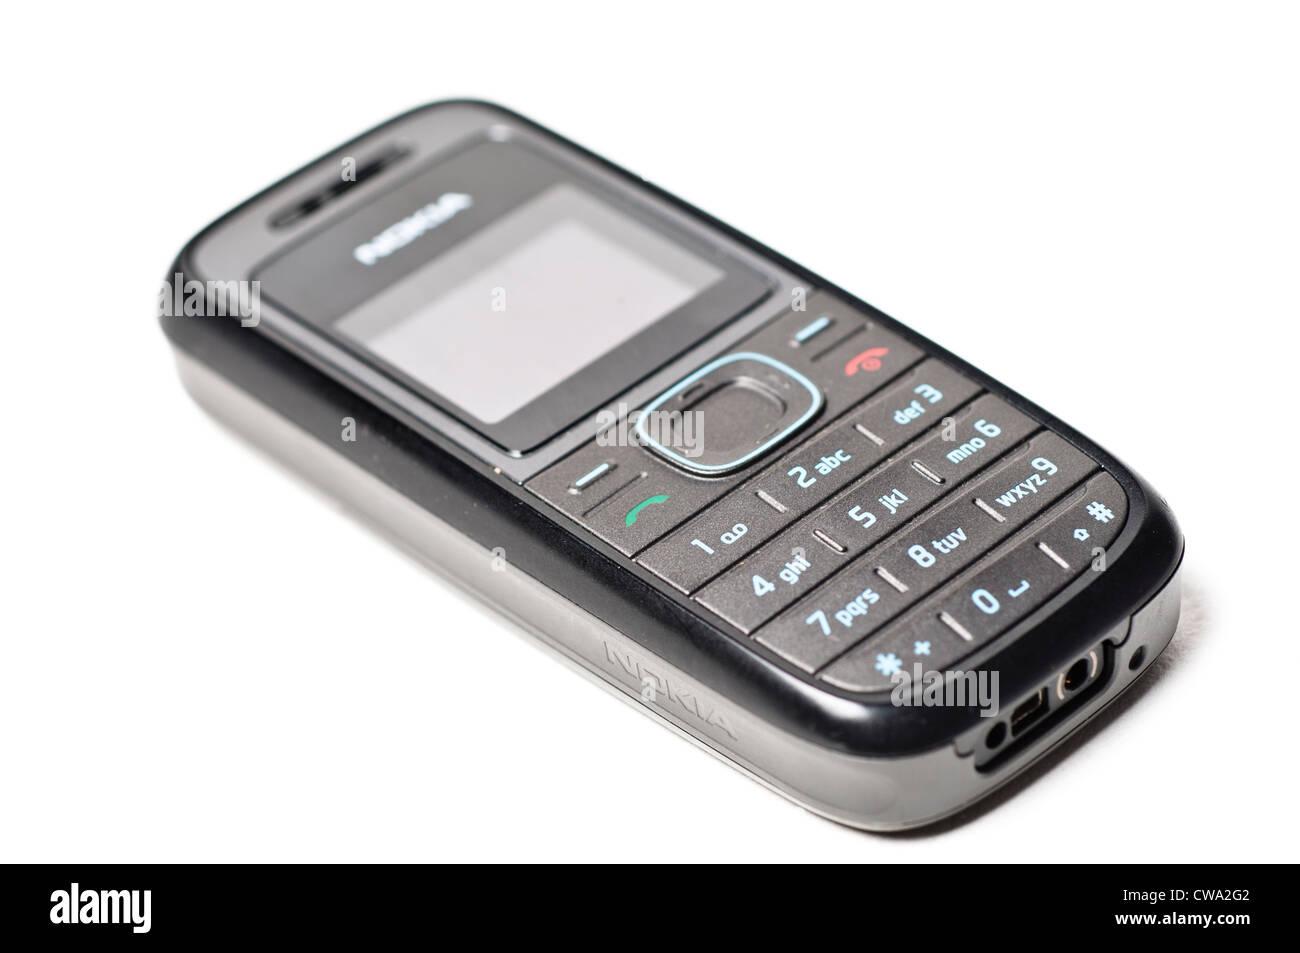 Basic mobile phone - Stock Image